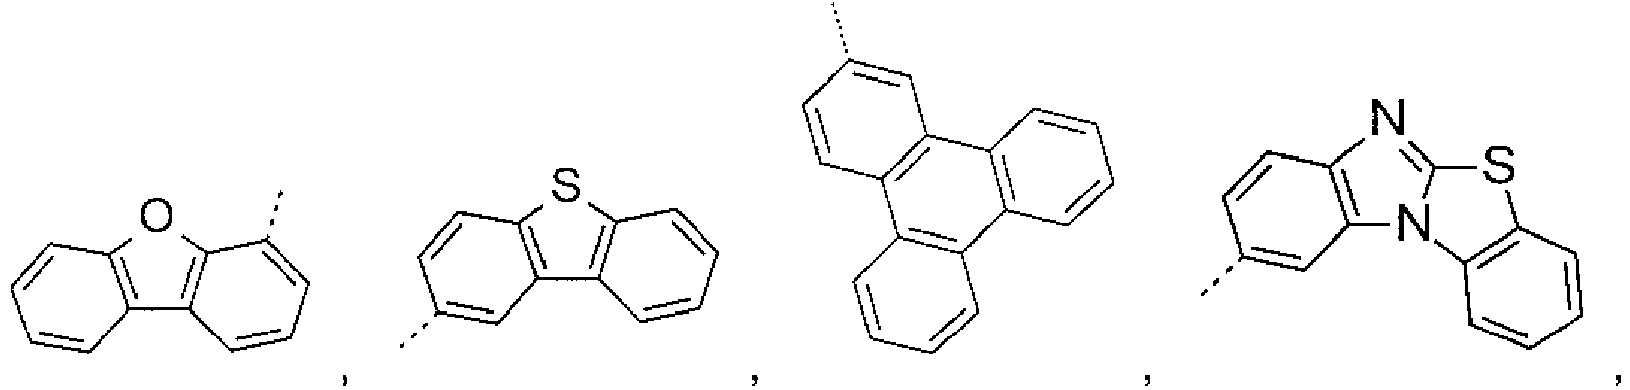 Figure imgb0767